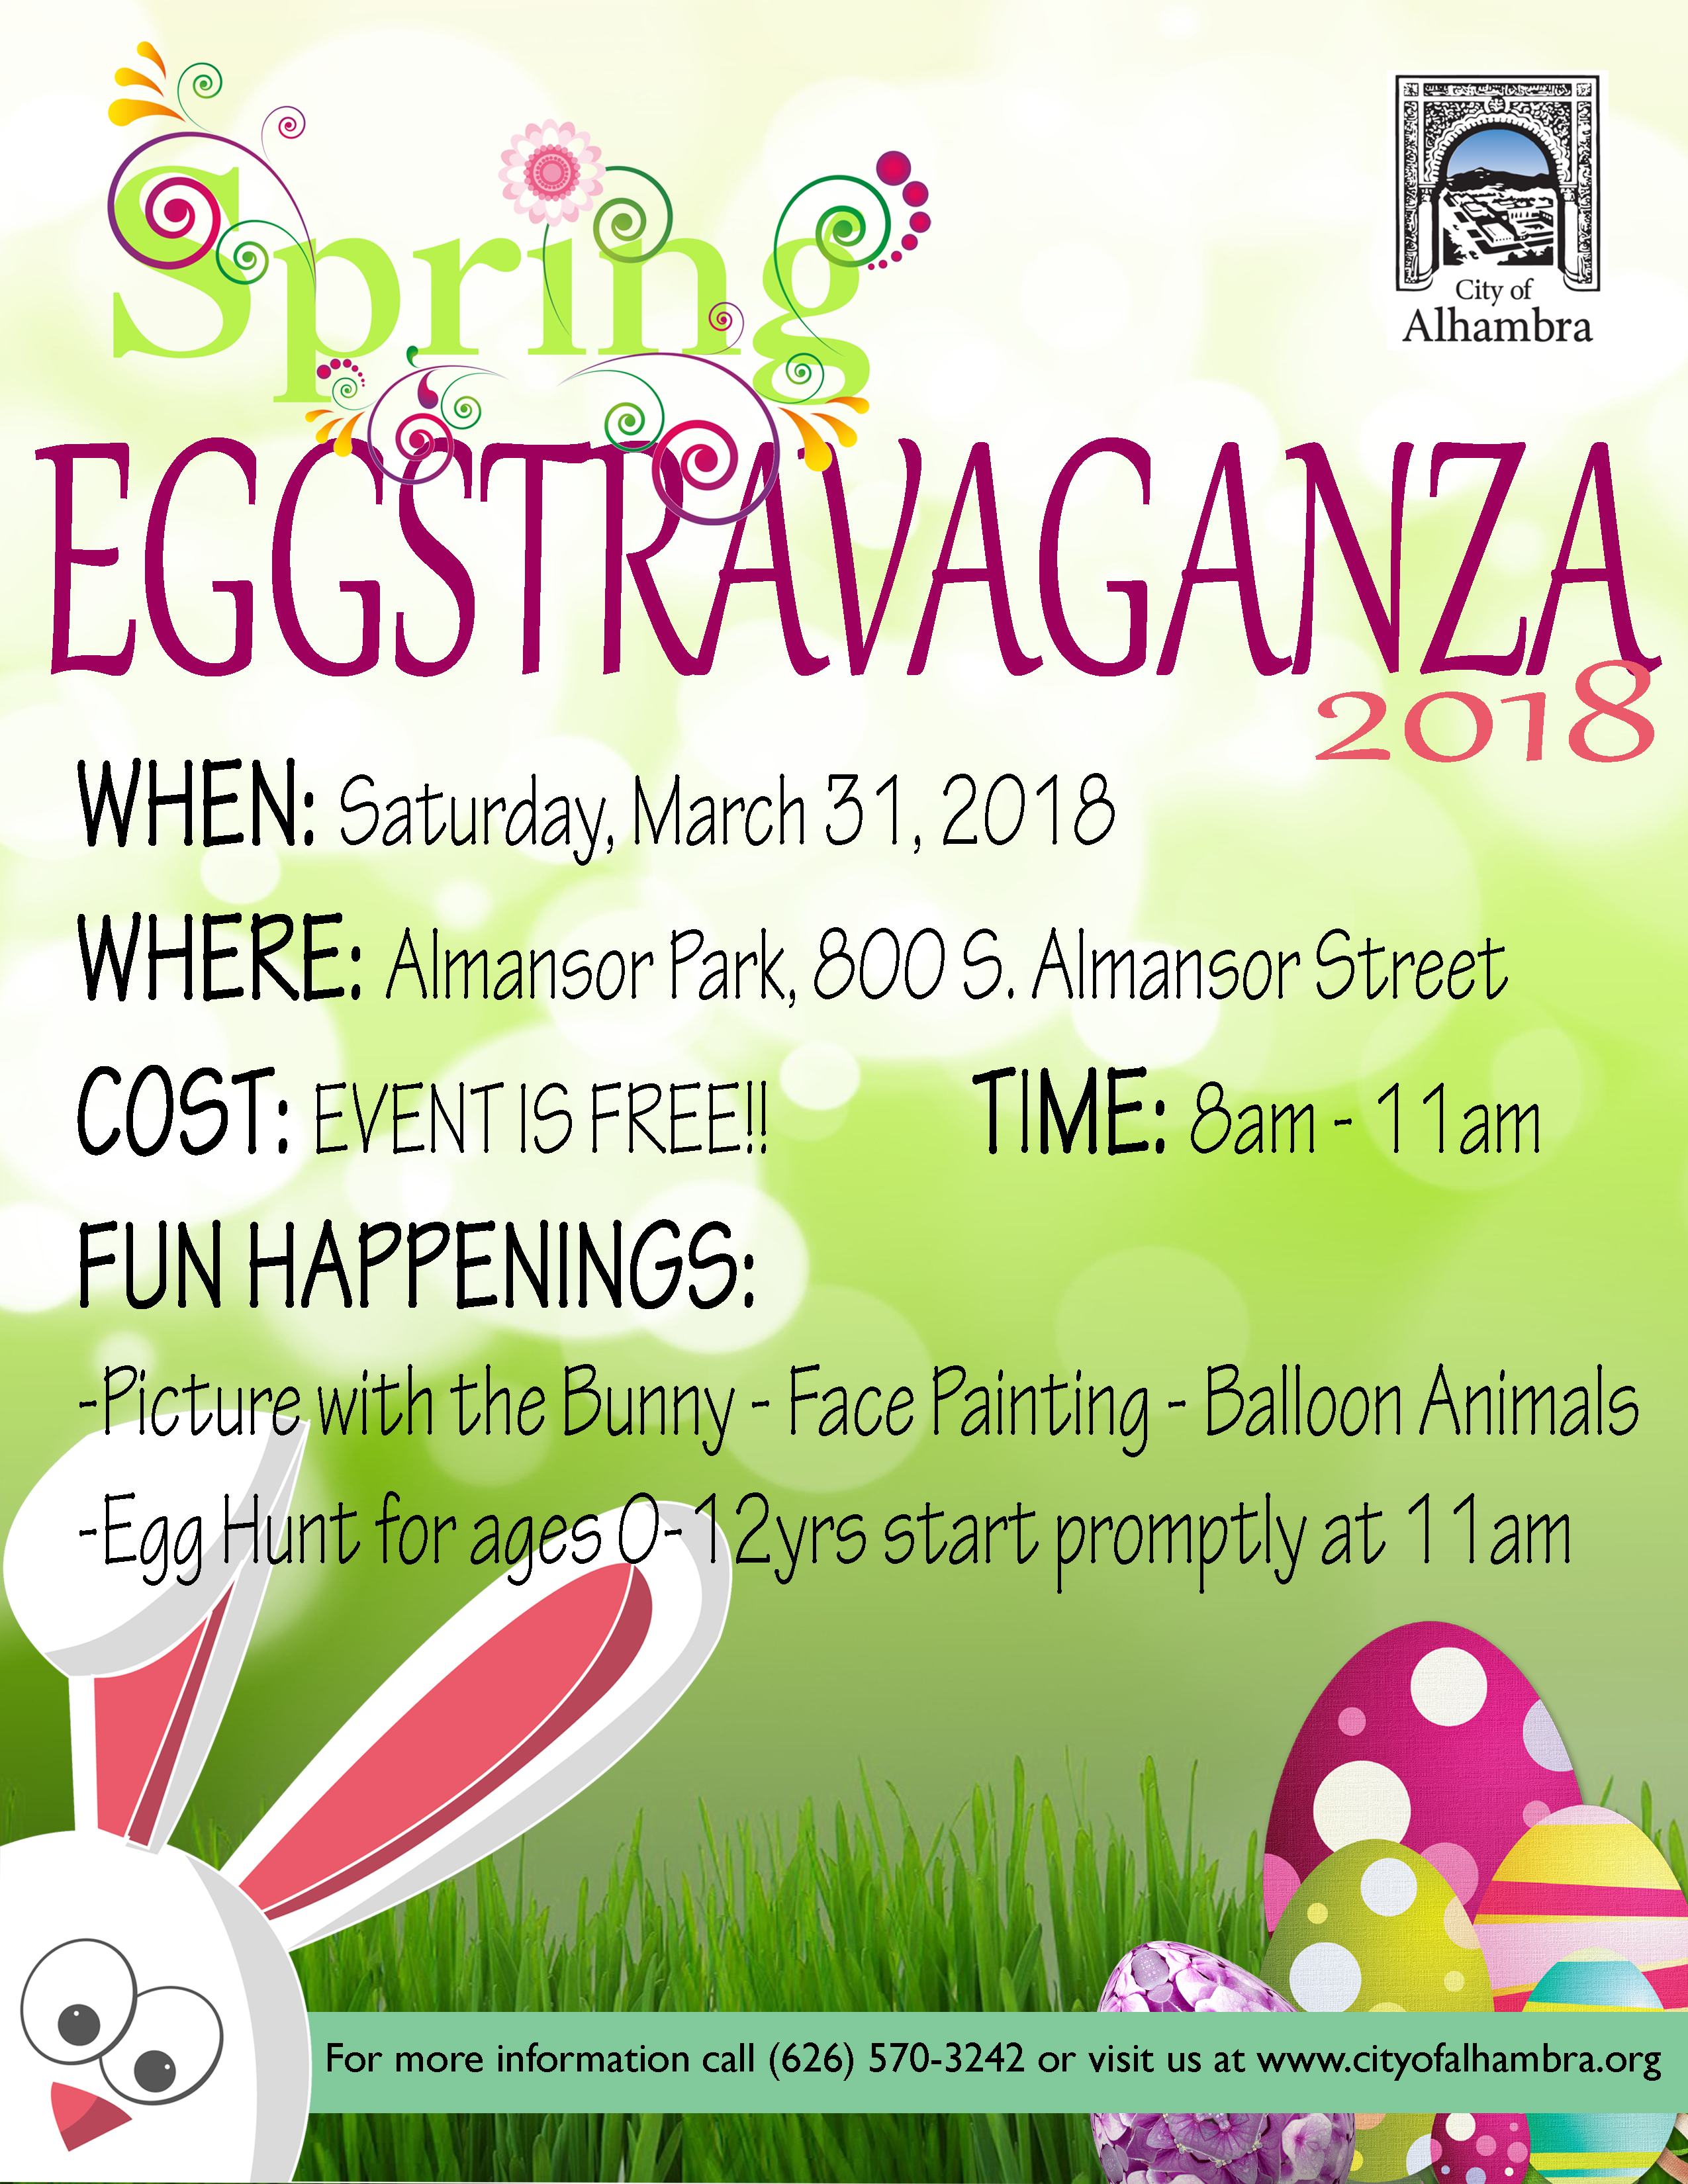 Eggstravaganza 2018, Saturday, March 31, 2018 event flyer image